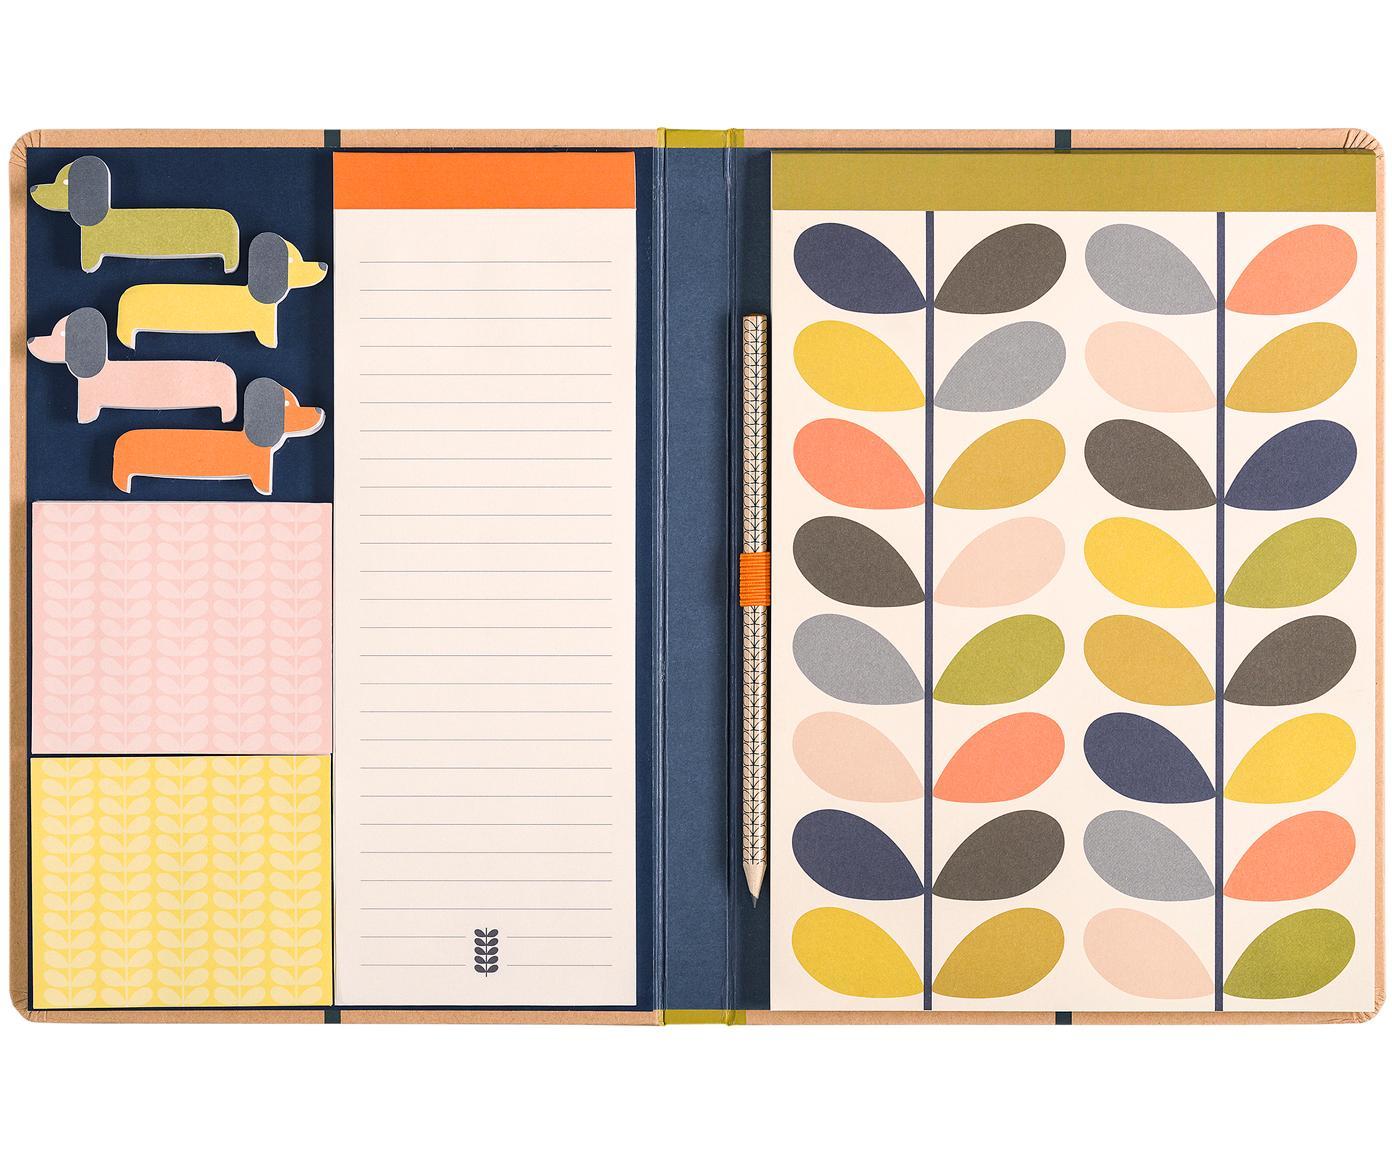 Haftnotiz-Block Stem, Papier, Mehrfarbig, 20 x 27 cm